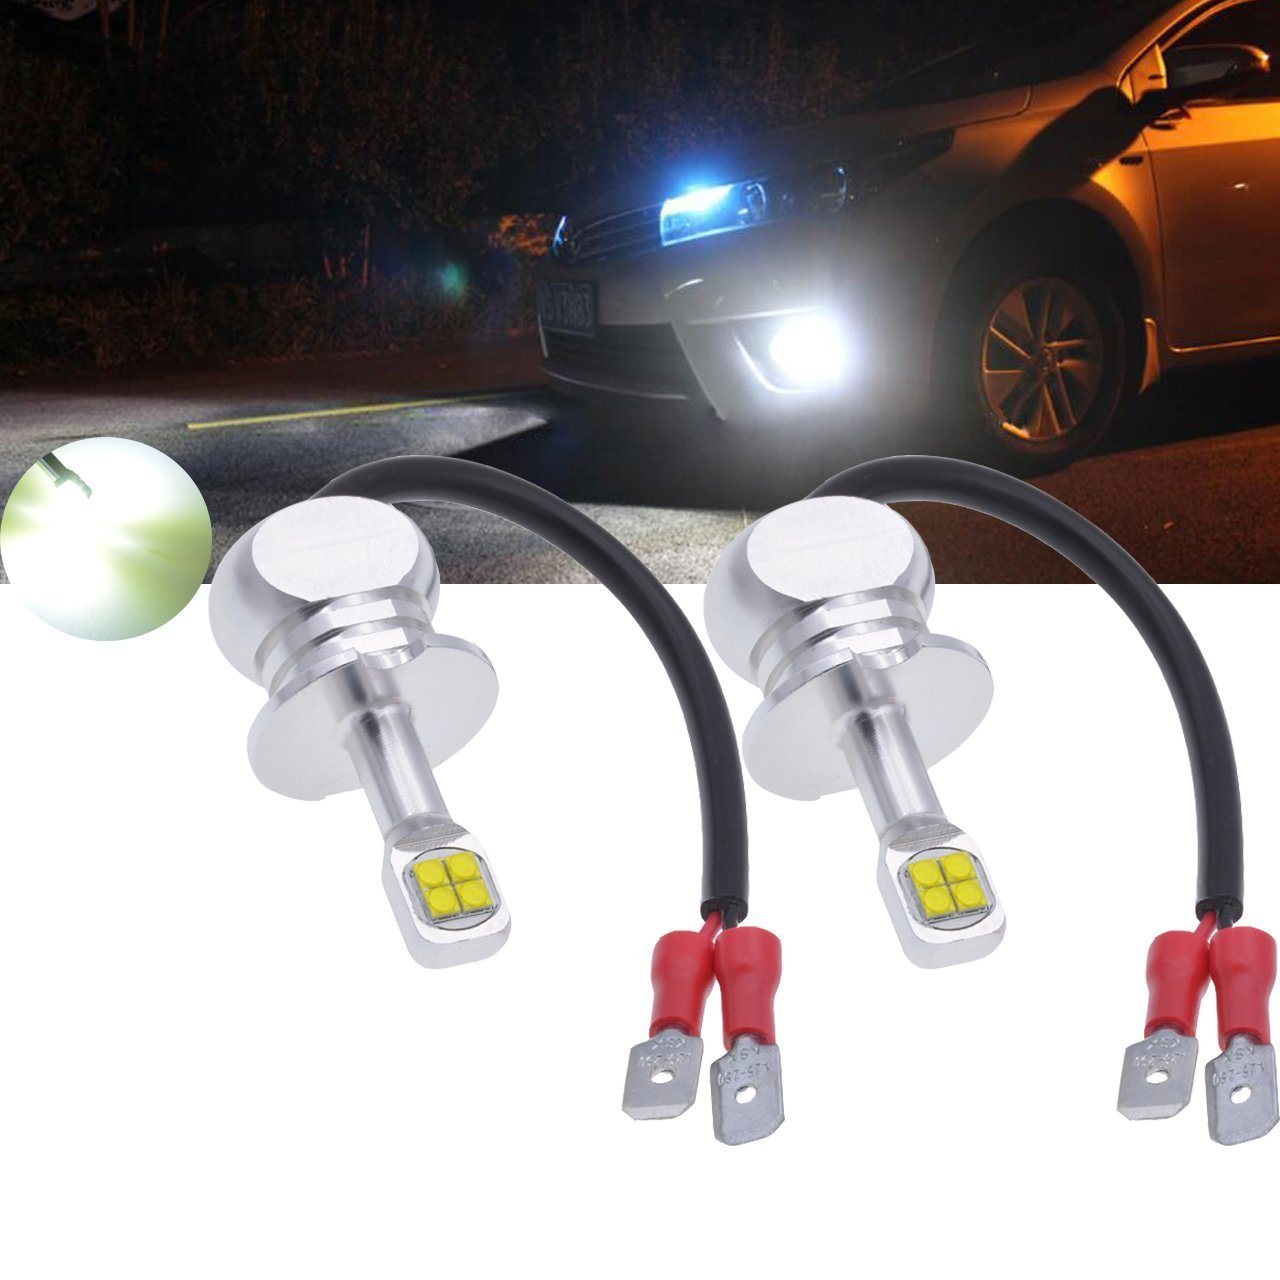 TUINCYN Lampadine LED CREE 8 SMD Canbus super luminose da 1500 lumen, adatte per H1, senza errori, utilizzate per luci di marcia diurne, impermeabili, bianco 6000 K (confezione da 2)